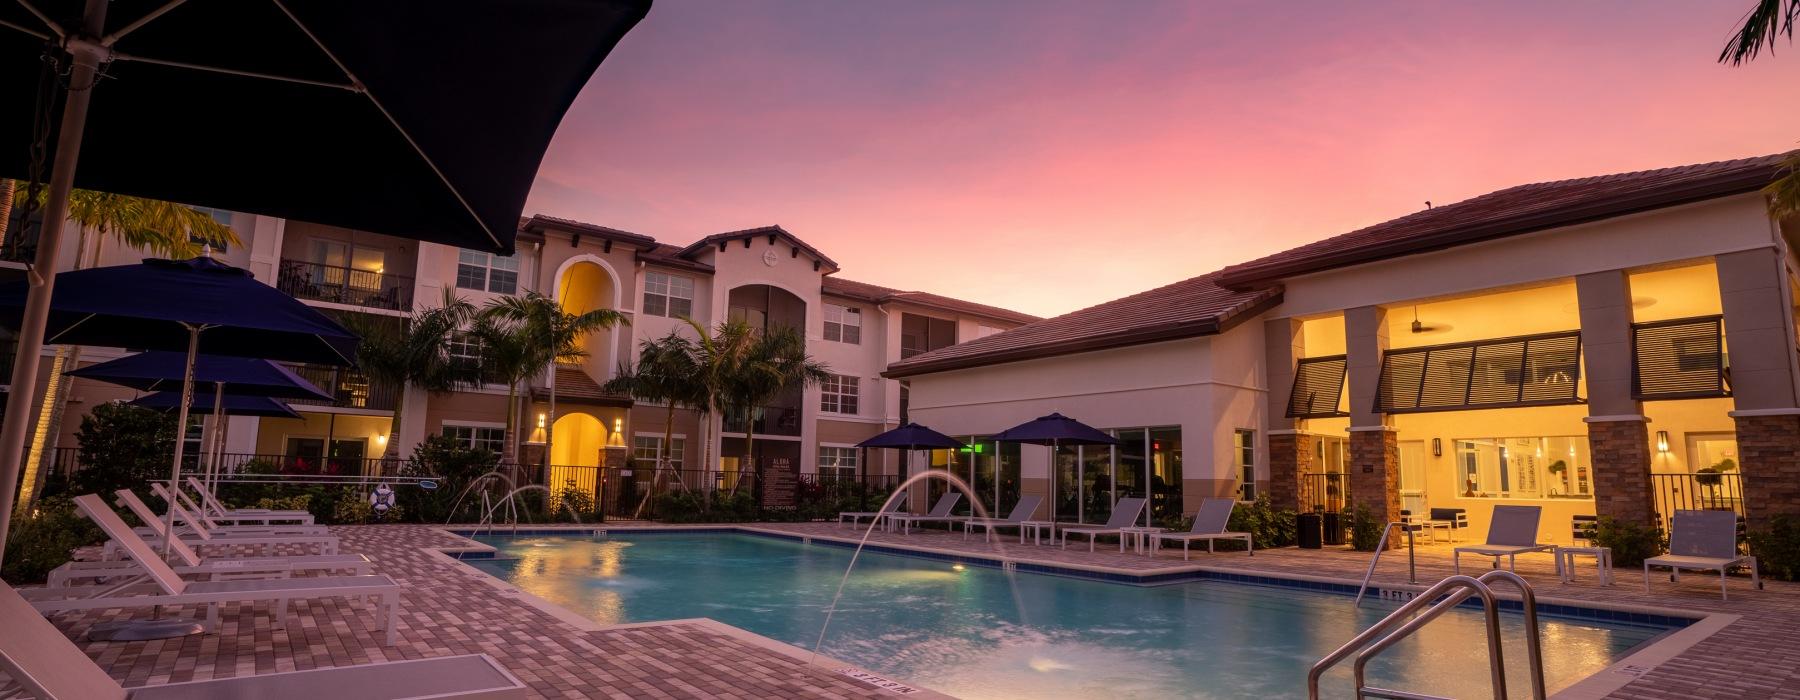 Alora at Sunset w/ Pool